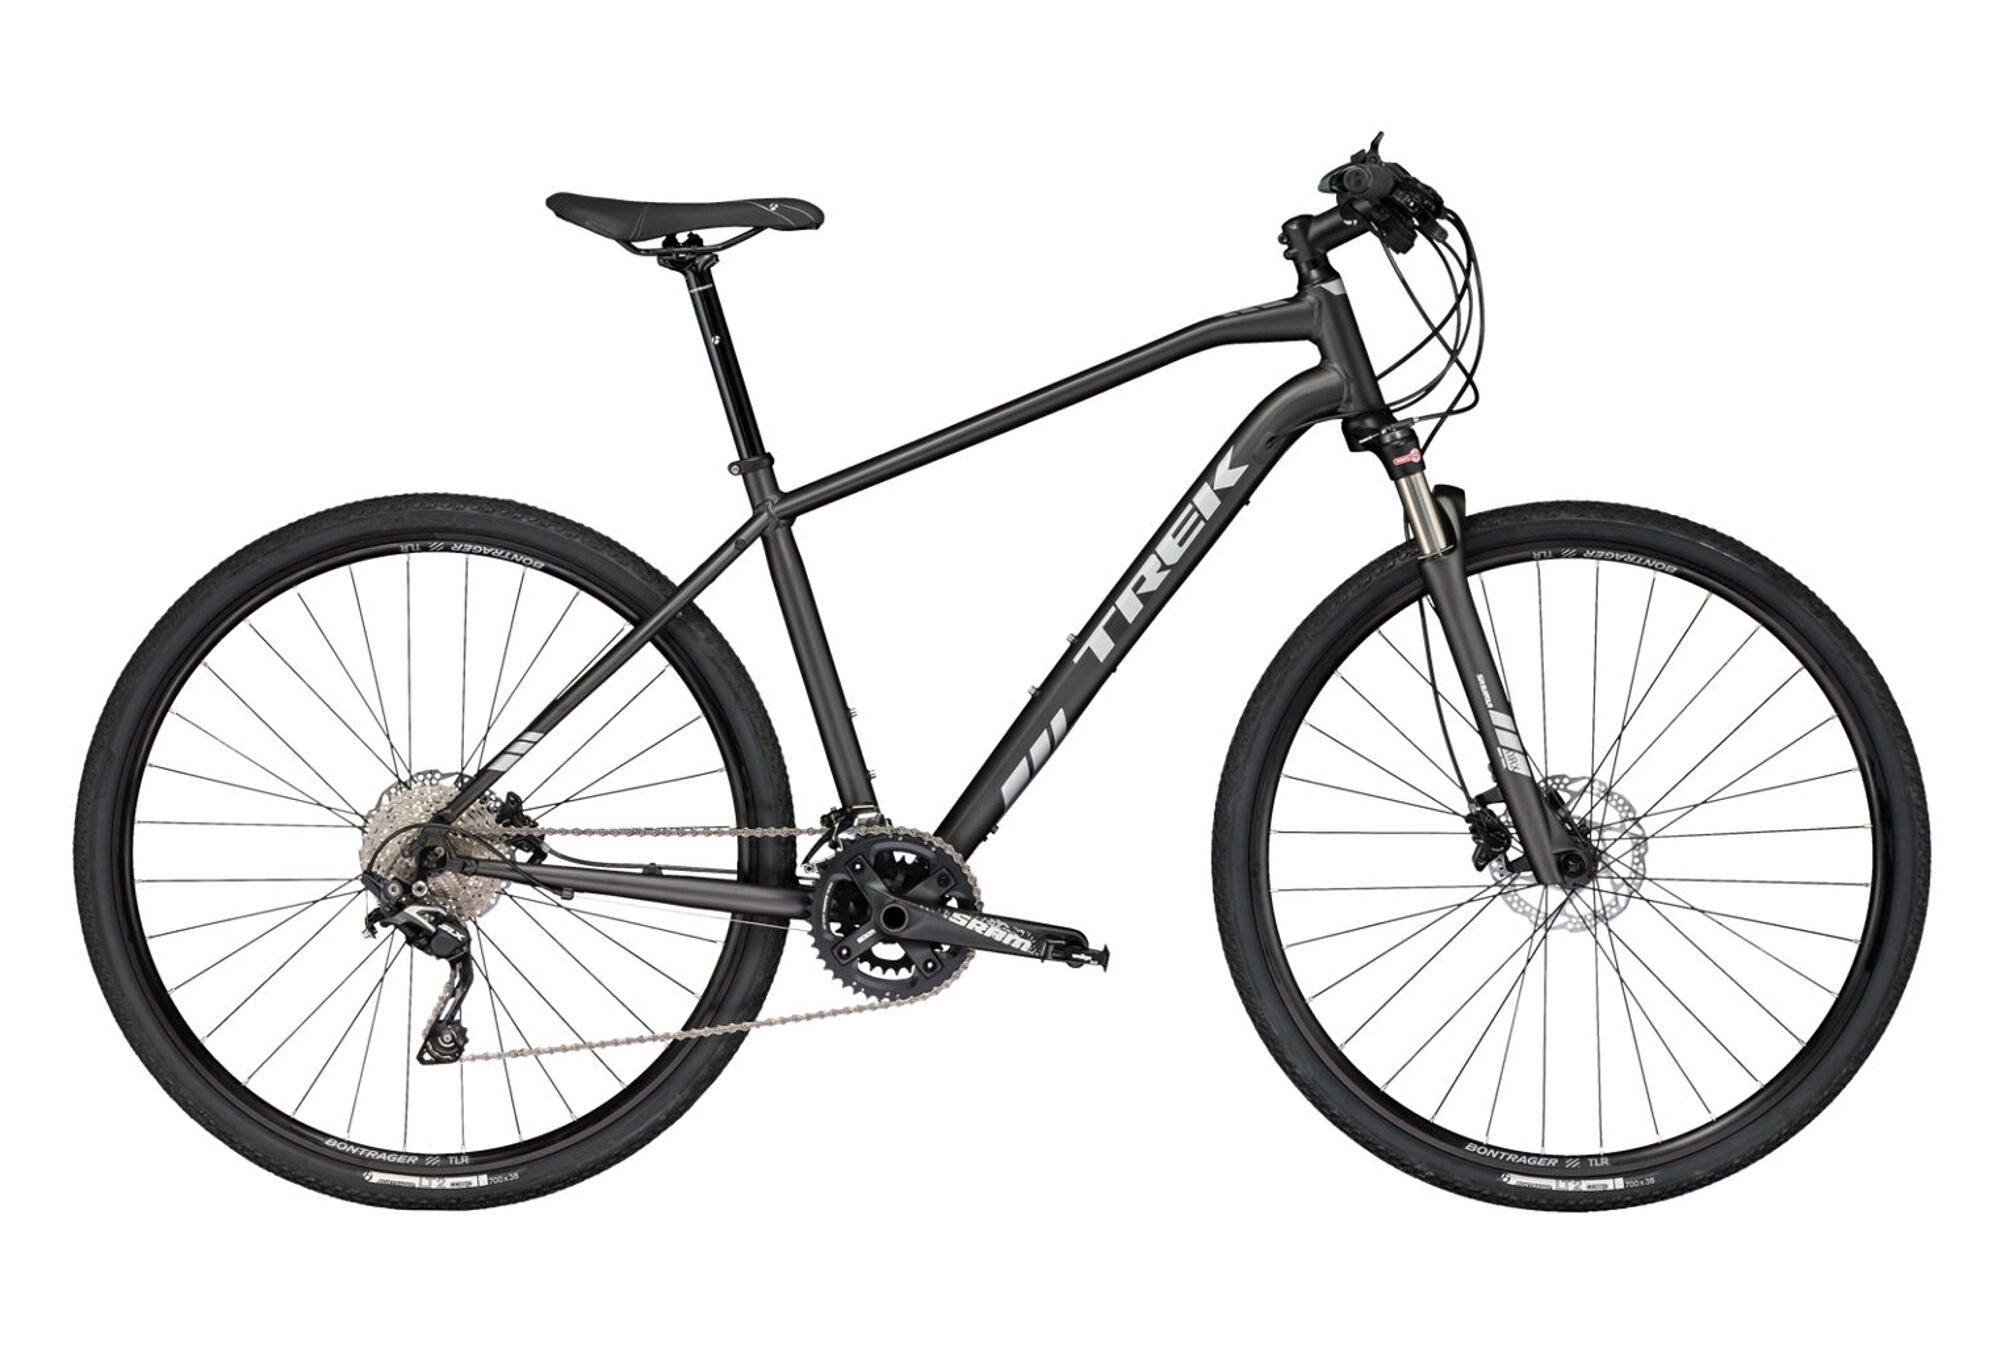 Trek Ds 4 Urban Bike Shimano Deore Slx 10s Black